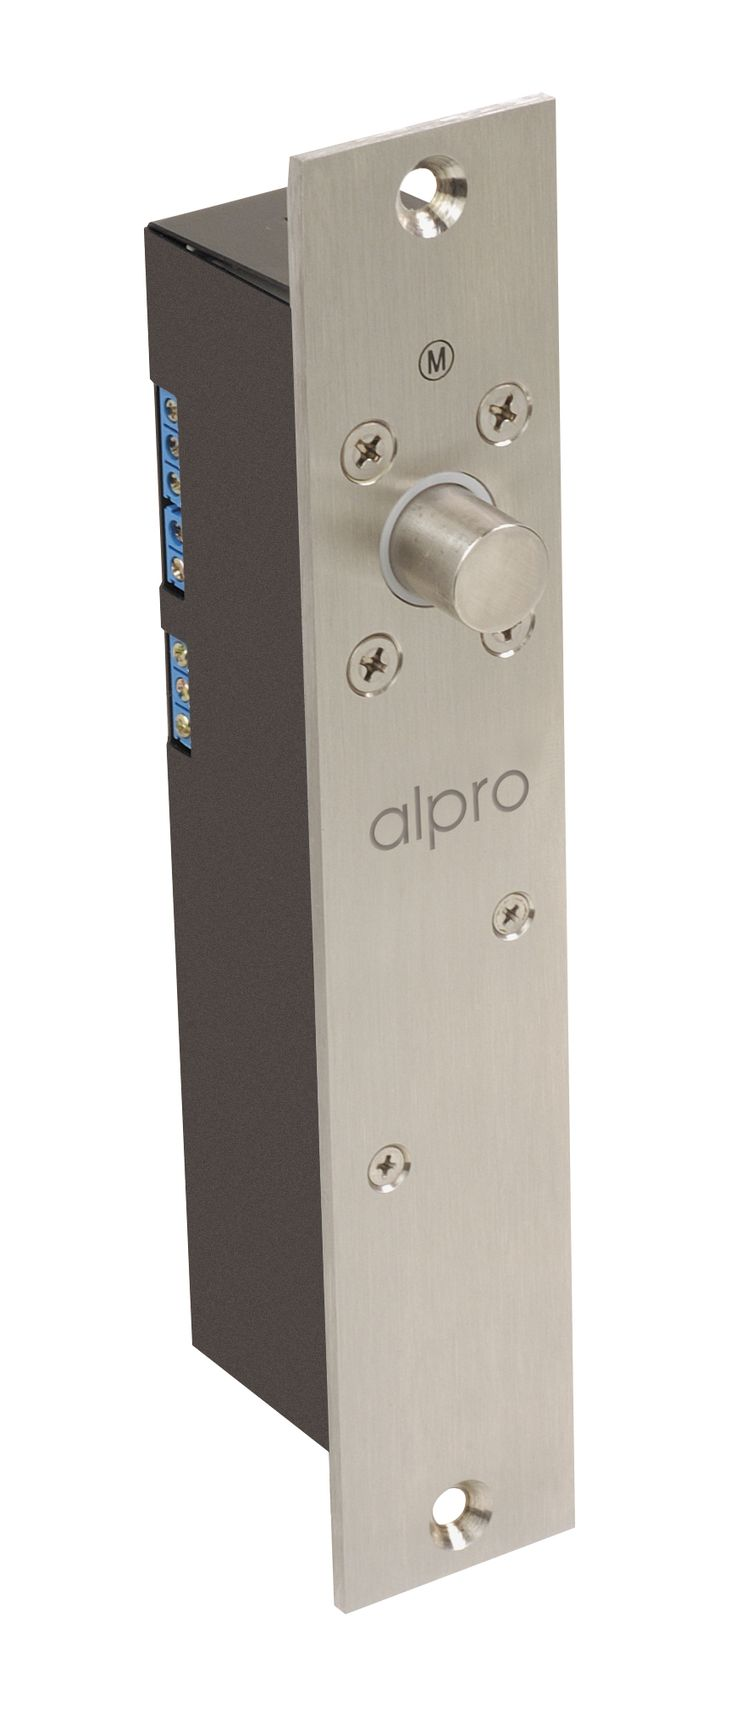 1000 ideas about electronic deadbolt on pinterest hotel lock keypad deadbolt and keyless. Black Bedroom Furniture Sets. Home Design Ideas